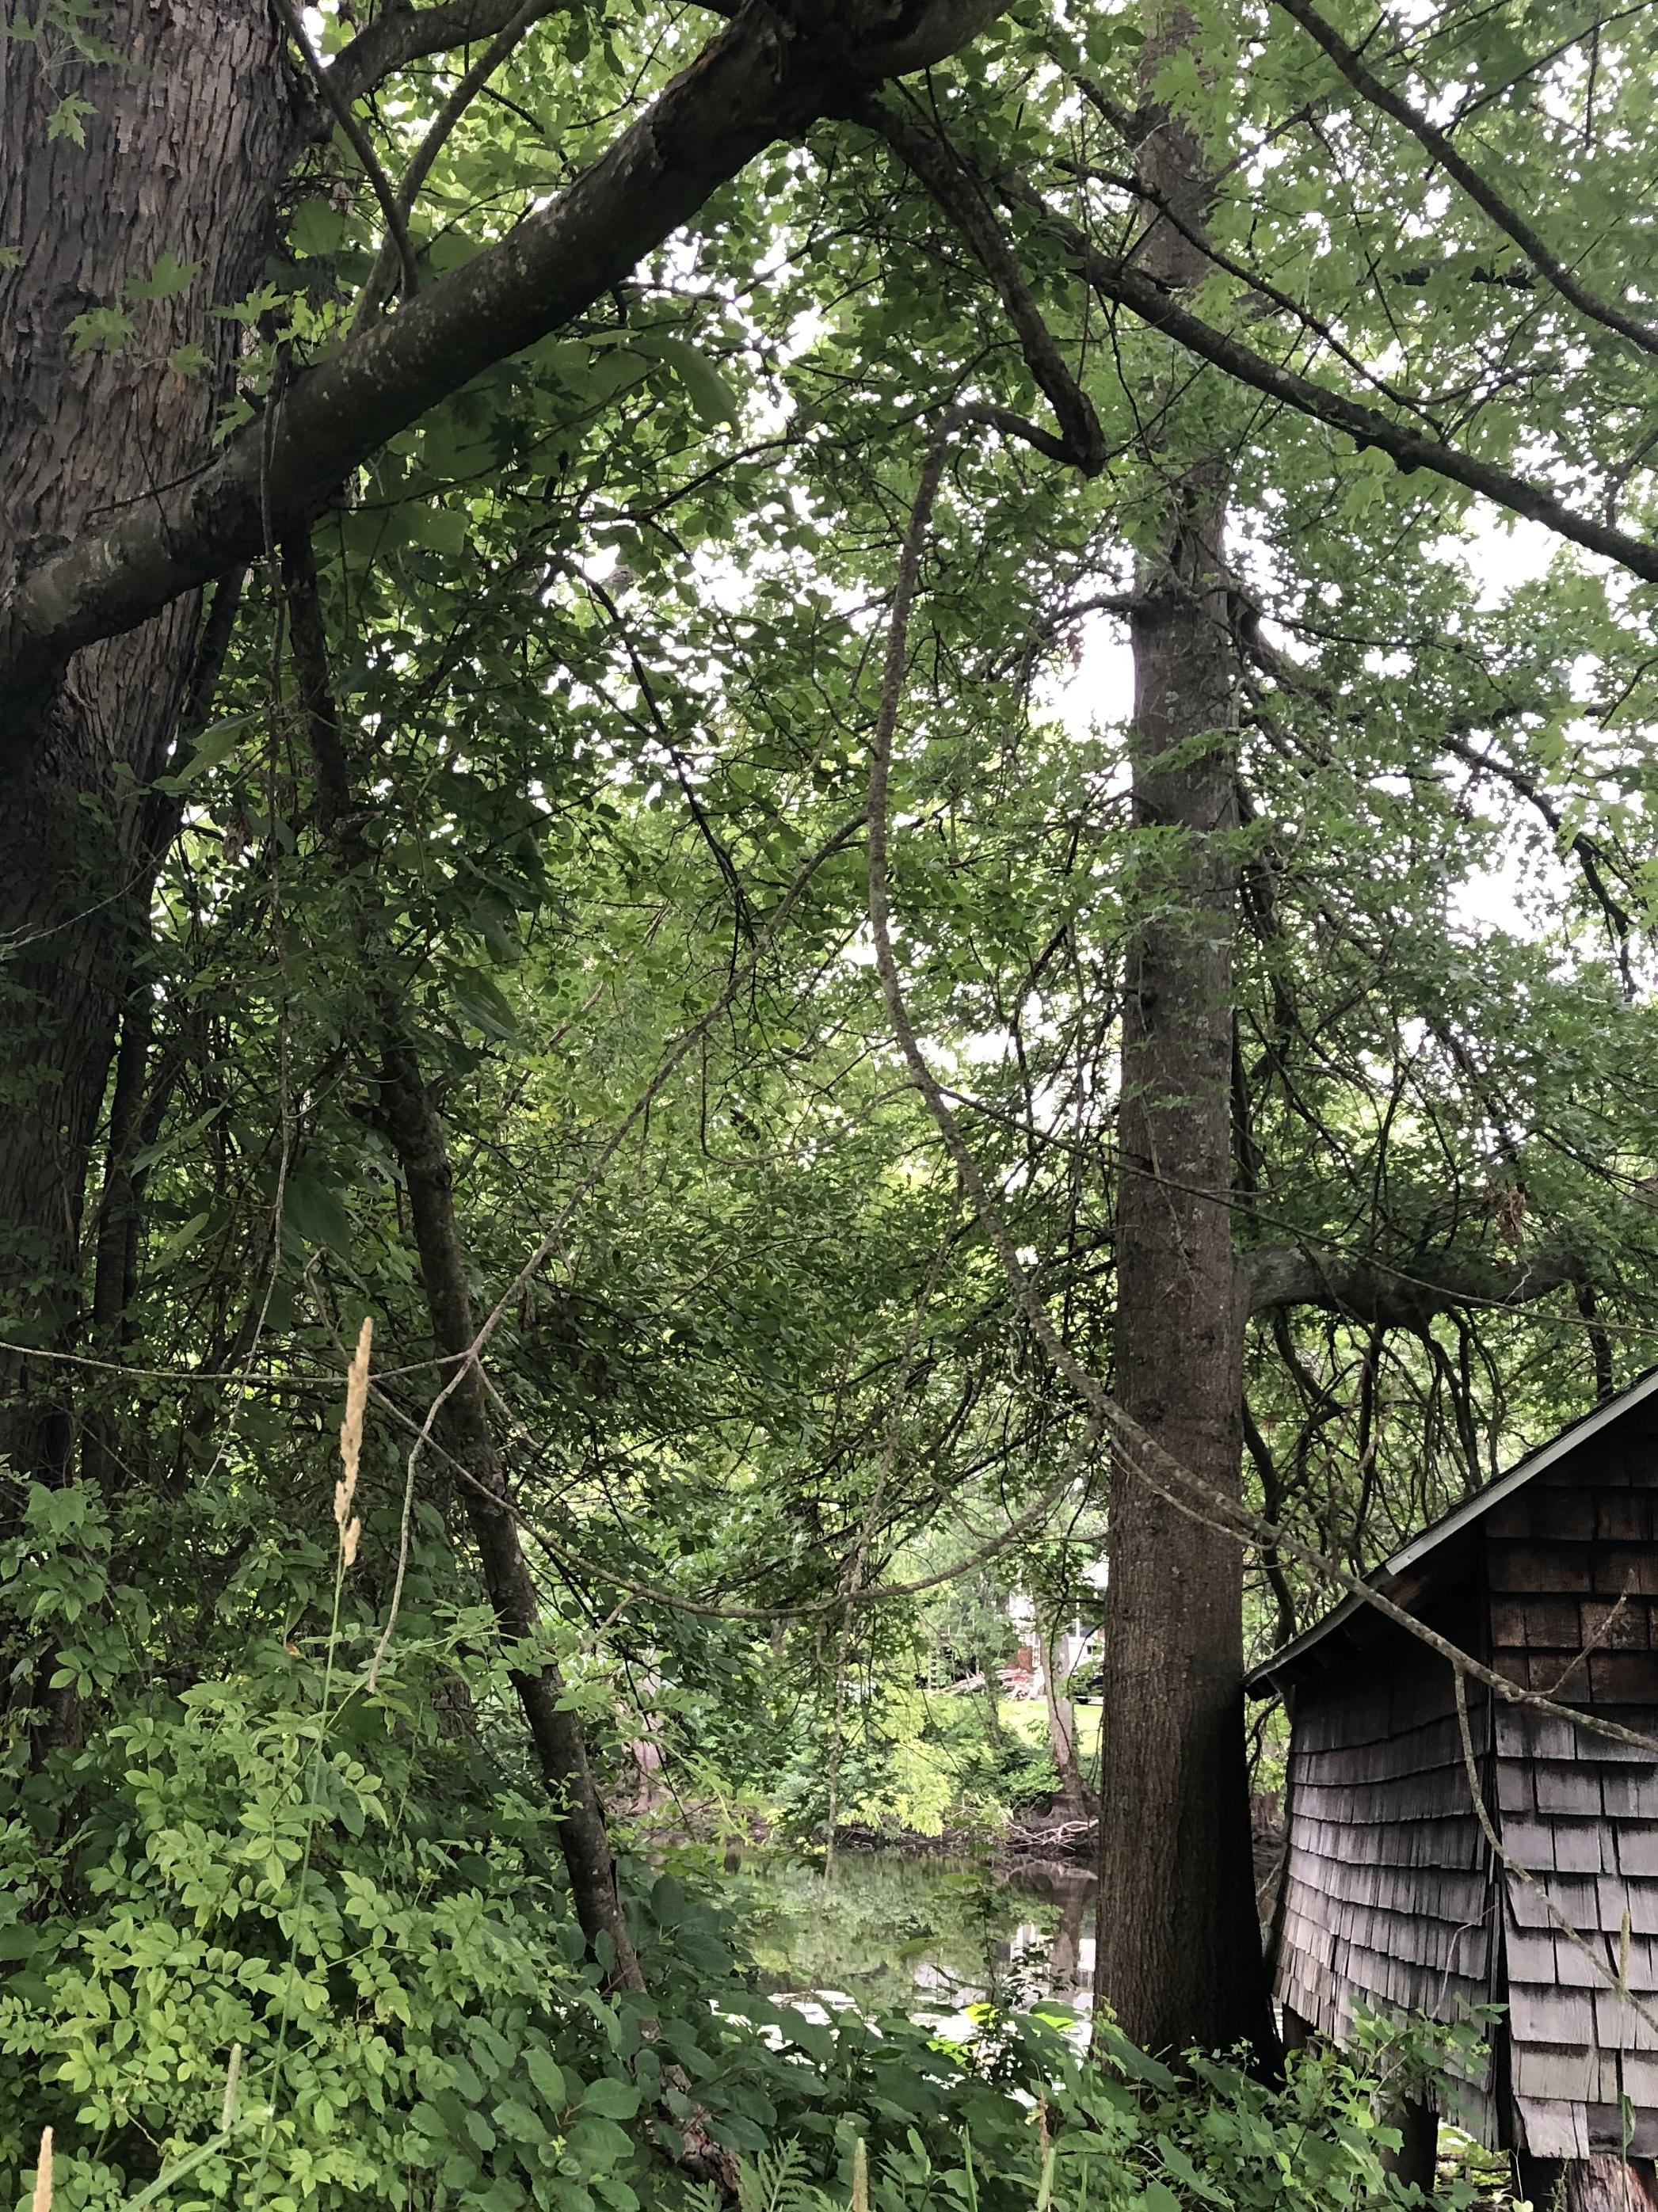 071020-river-shack